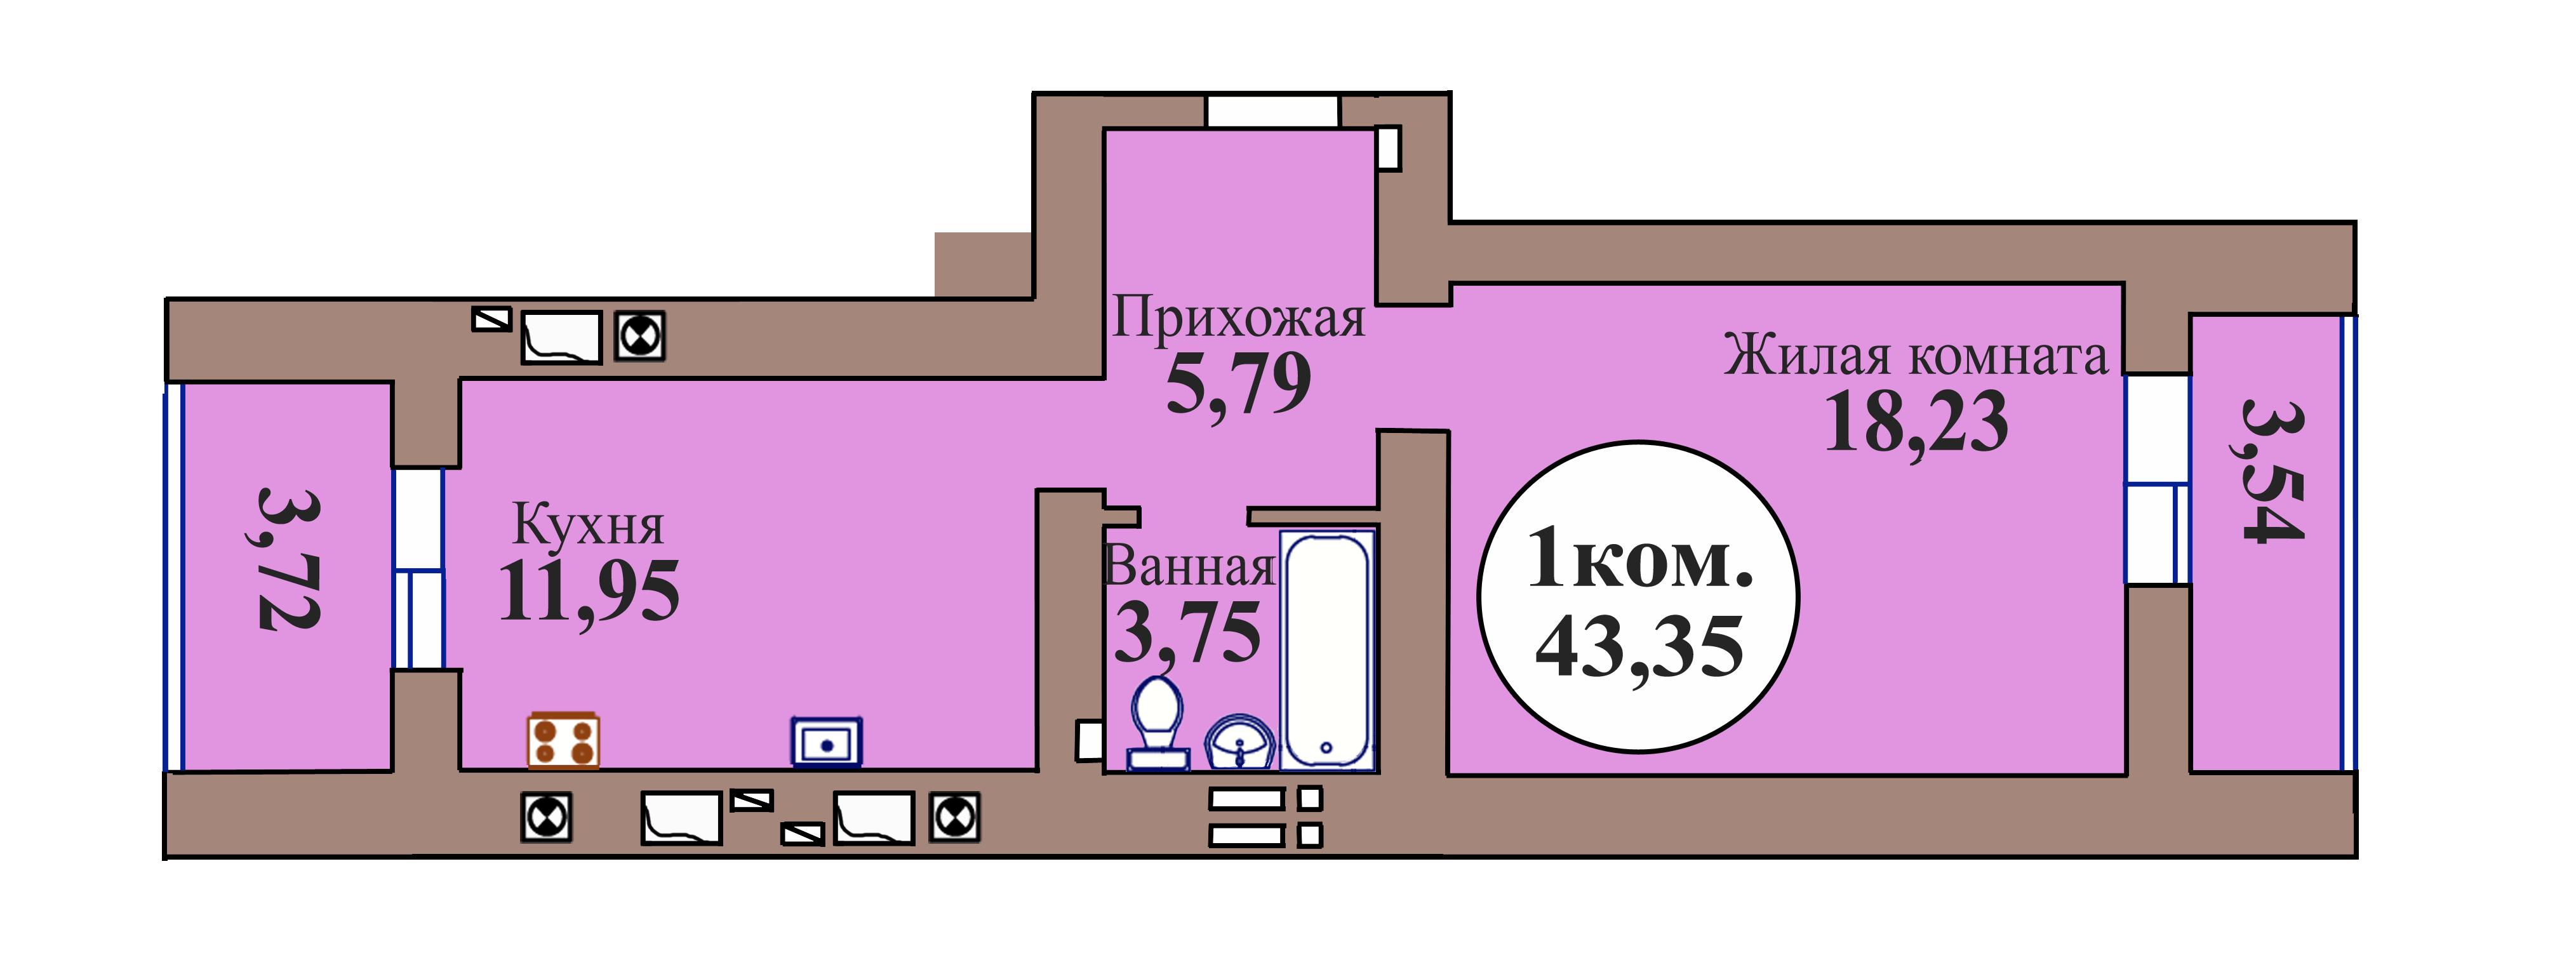 1-комн. кв. по пер. Калининградский, 5 кв. 74 в Калининграде